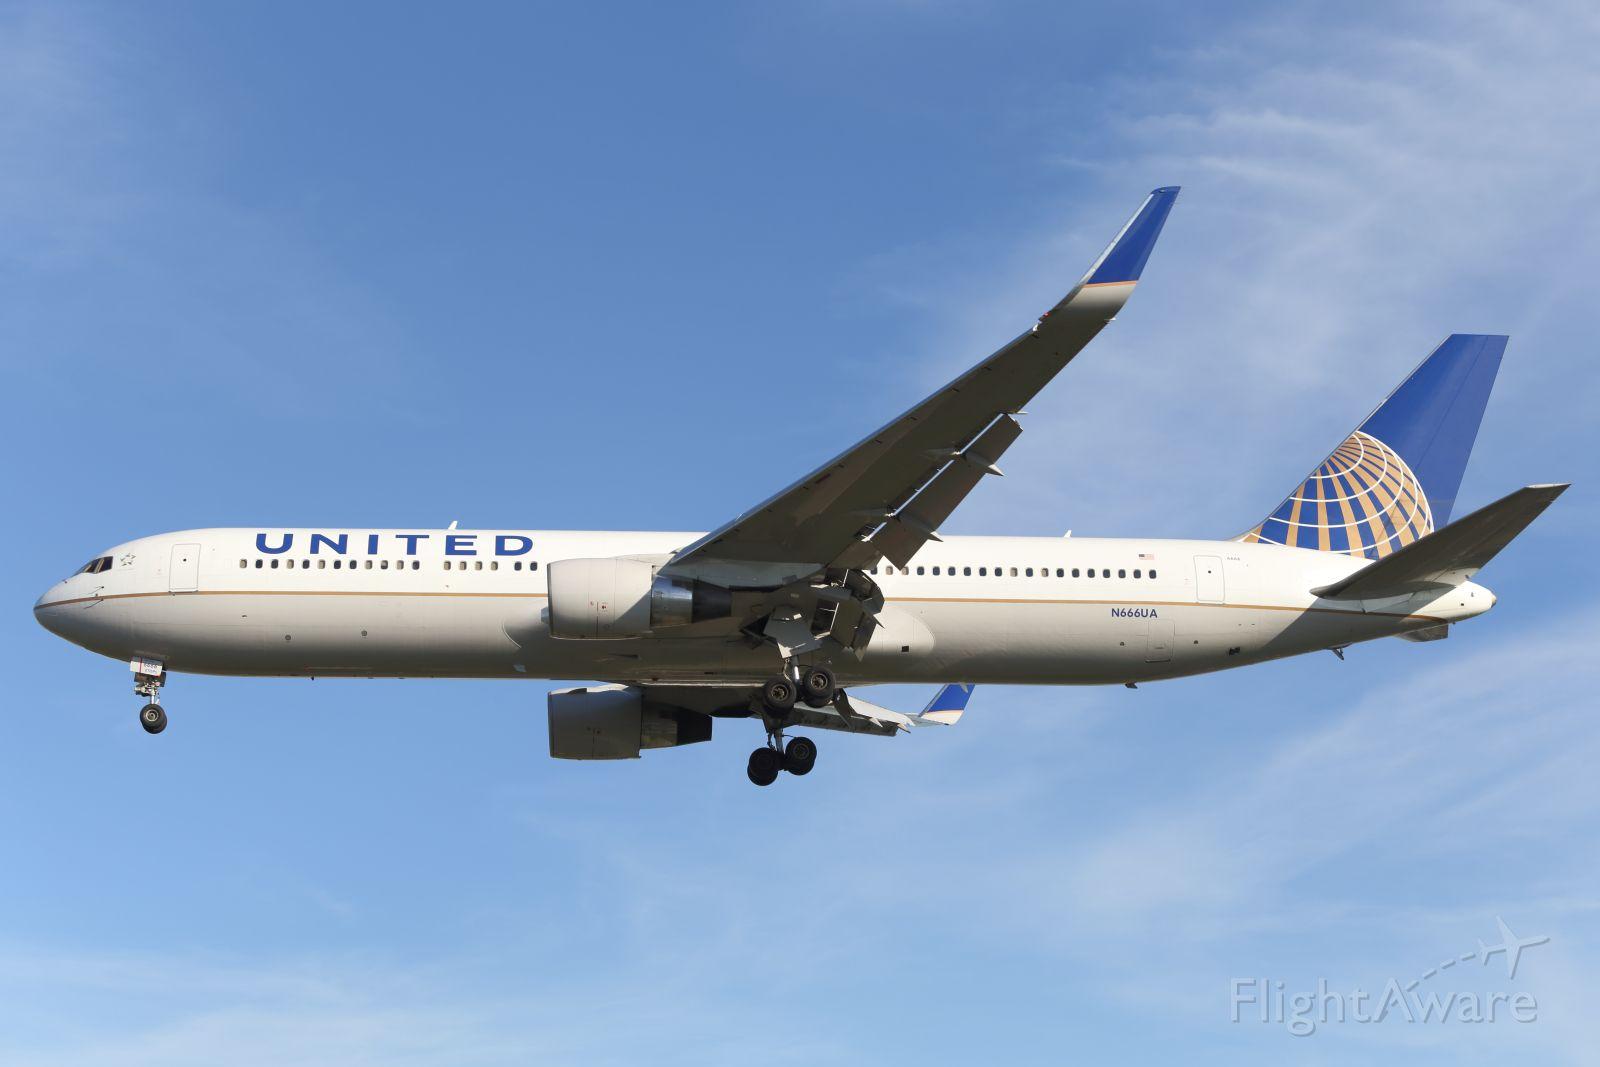 BOEING 767-300 (N666UA) - United, B767-300ER, approaches LHR.